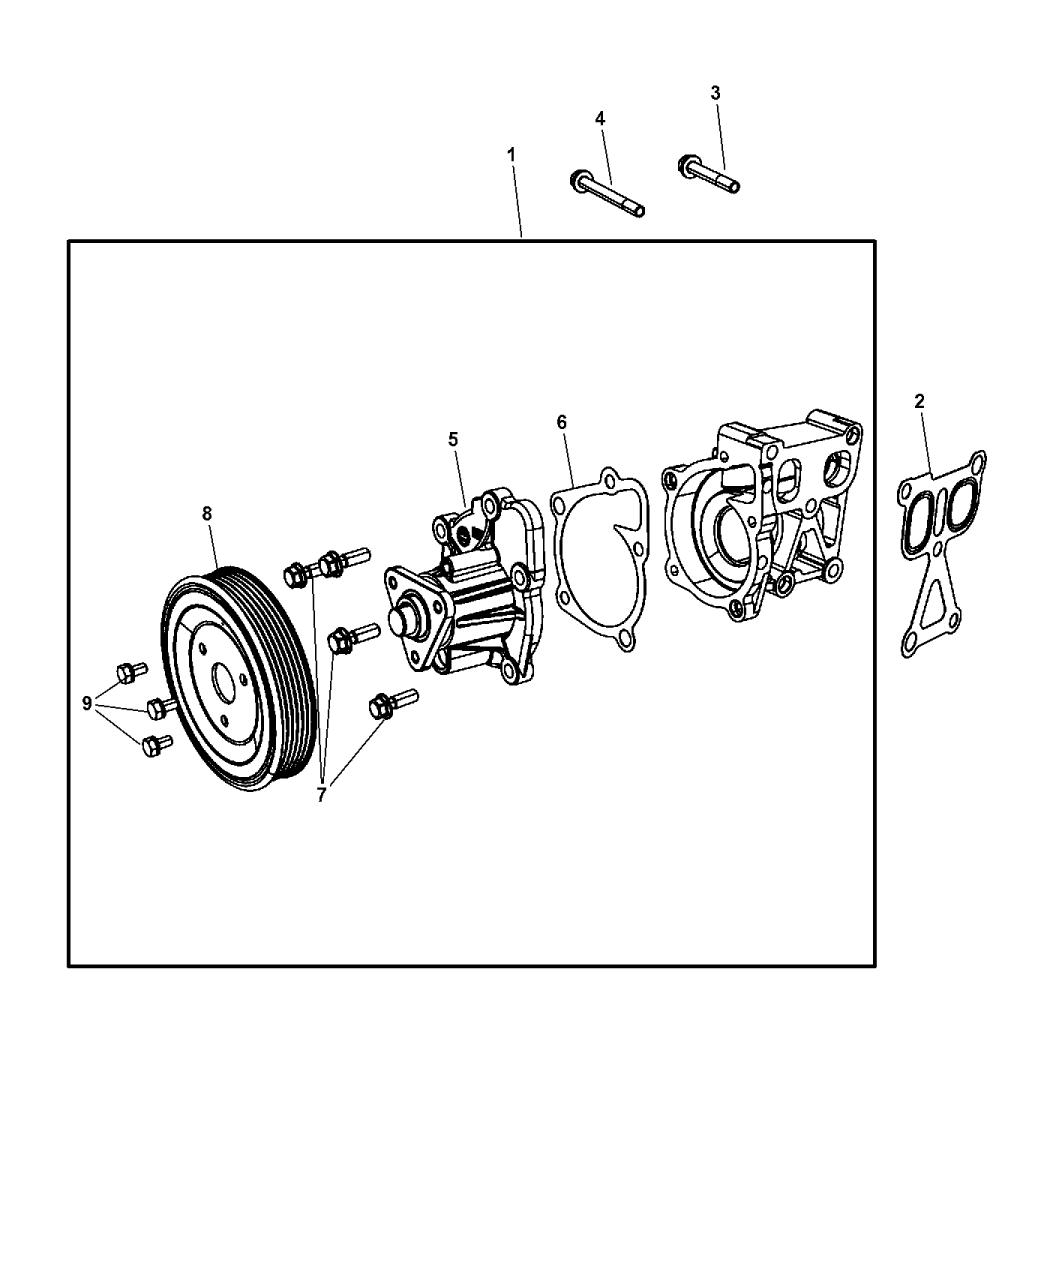 2013 Jeep Compass Water Pump Related Parts Mopar Giant Engine Diagram Thumbnail 1